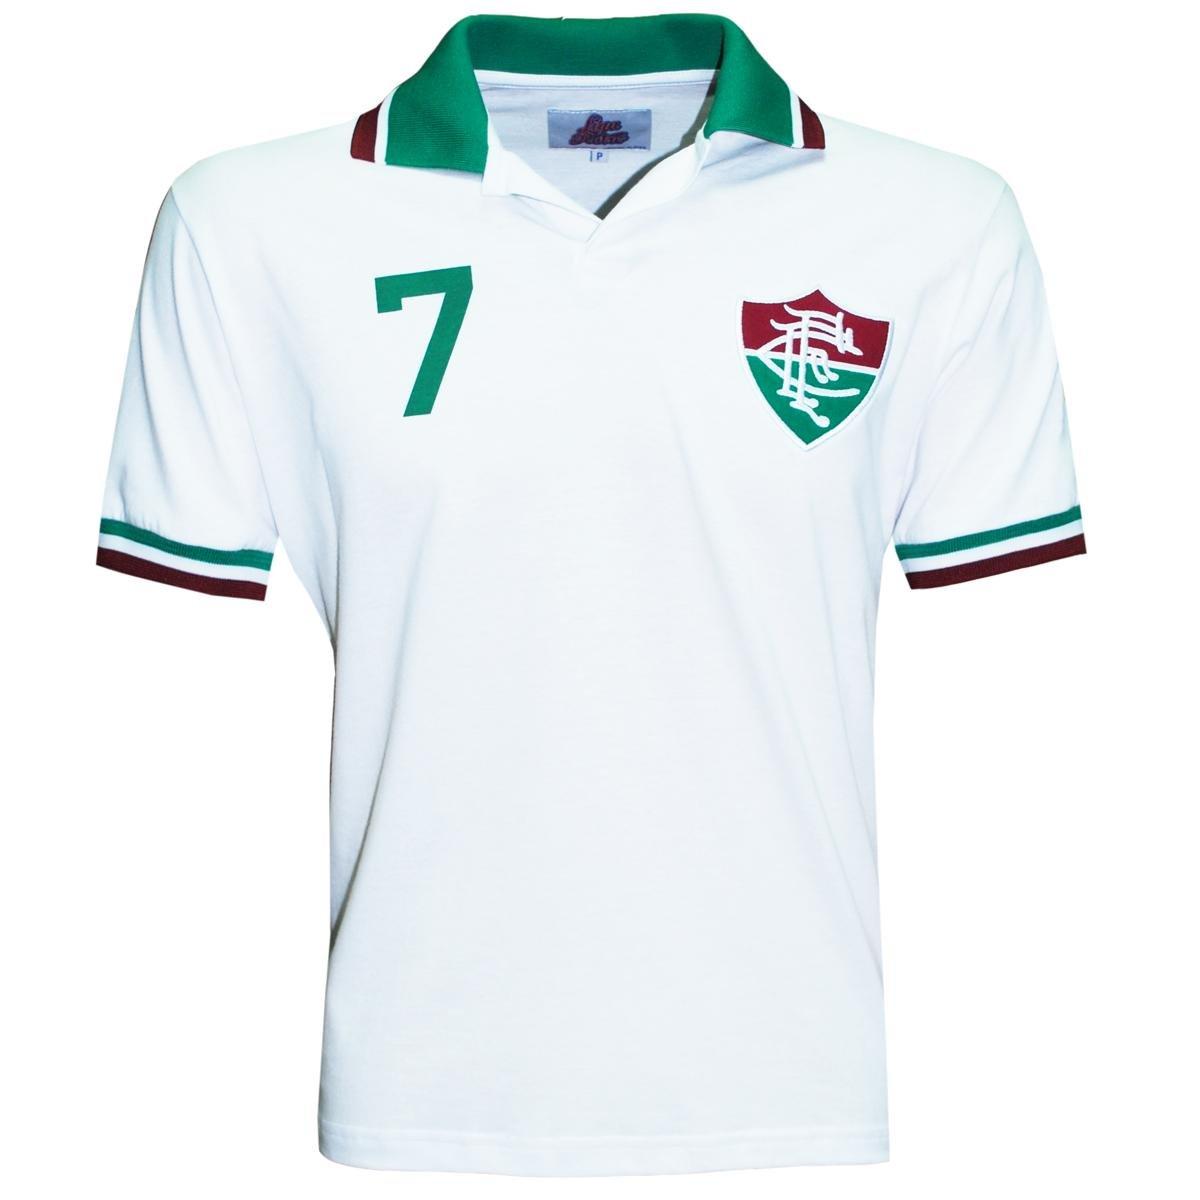 Camisa Liga Retrô Fluminense 1984 - Compre Agora  d0c42024eaf5d